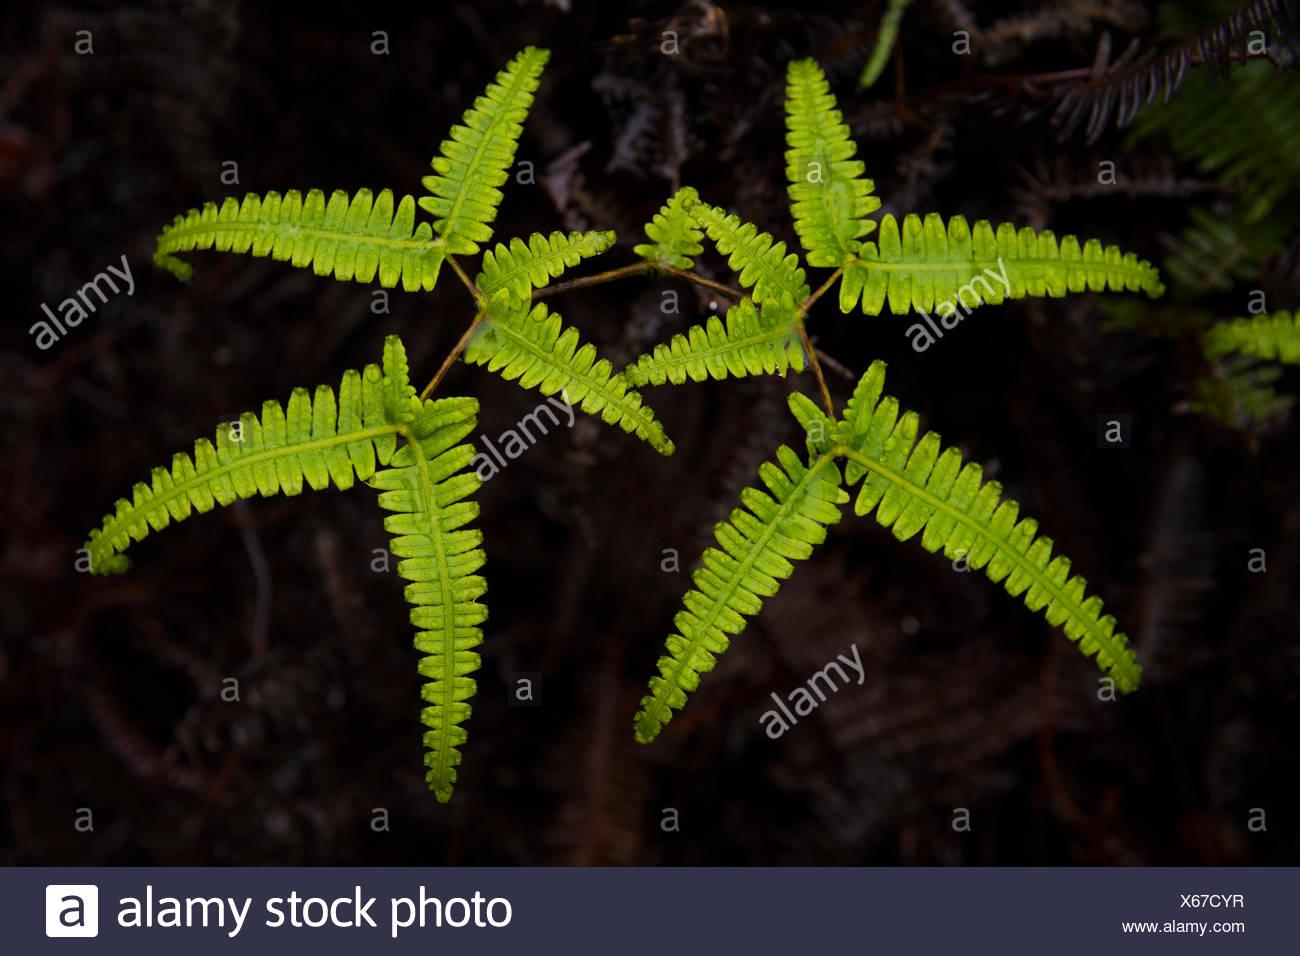 Kauai,plantas,bien Pali Kona,reserva,ESTADOS UNIDOS,Hawaii,Latina,la naturaleza, Imagen De Stock